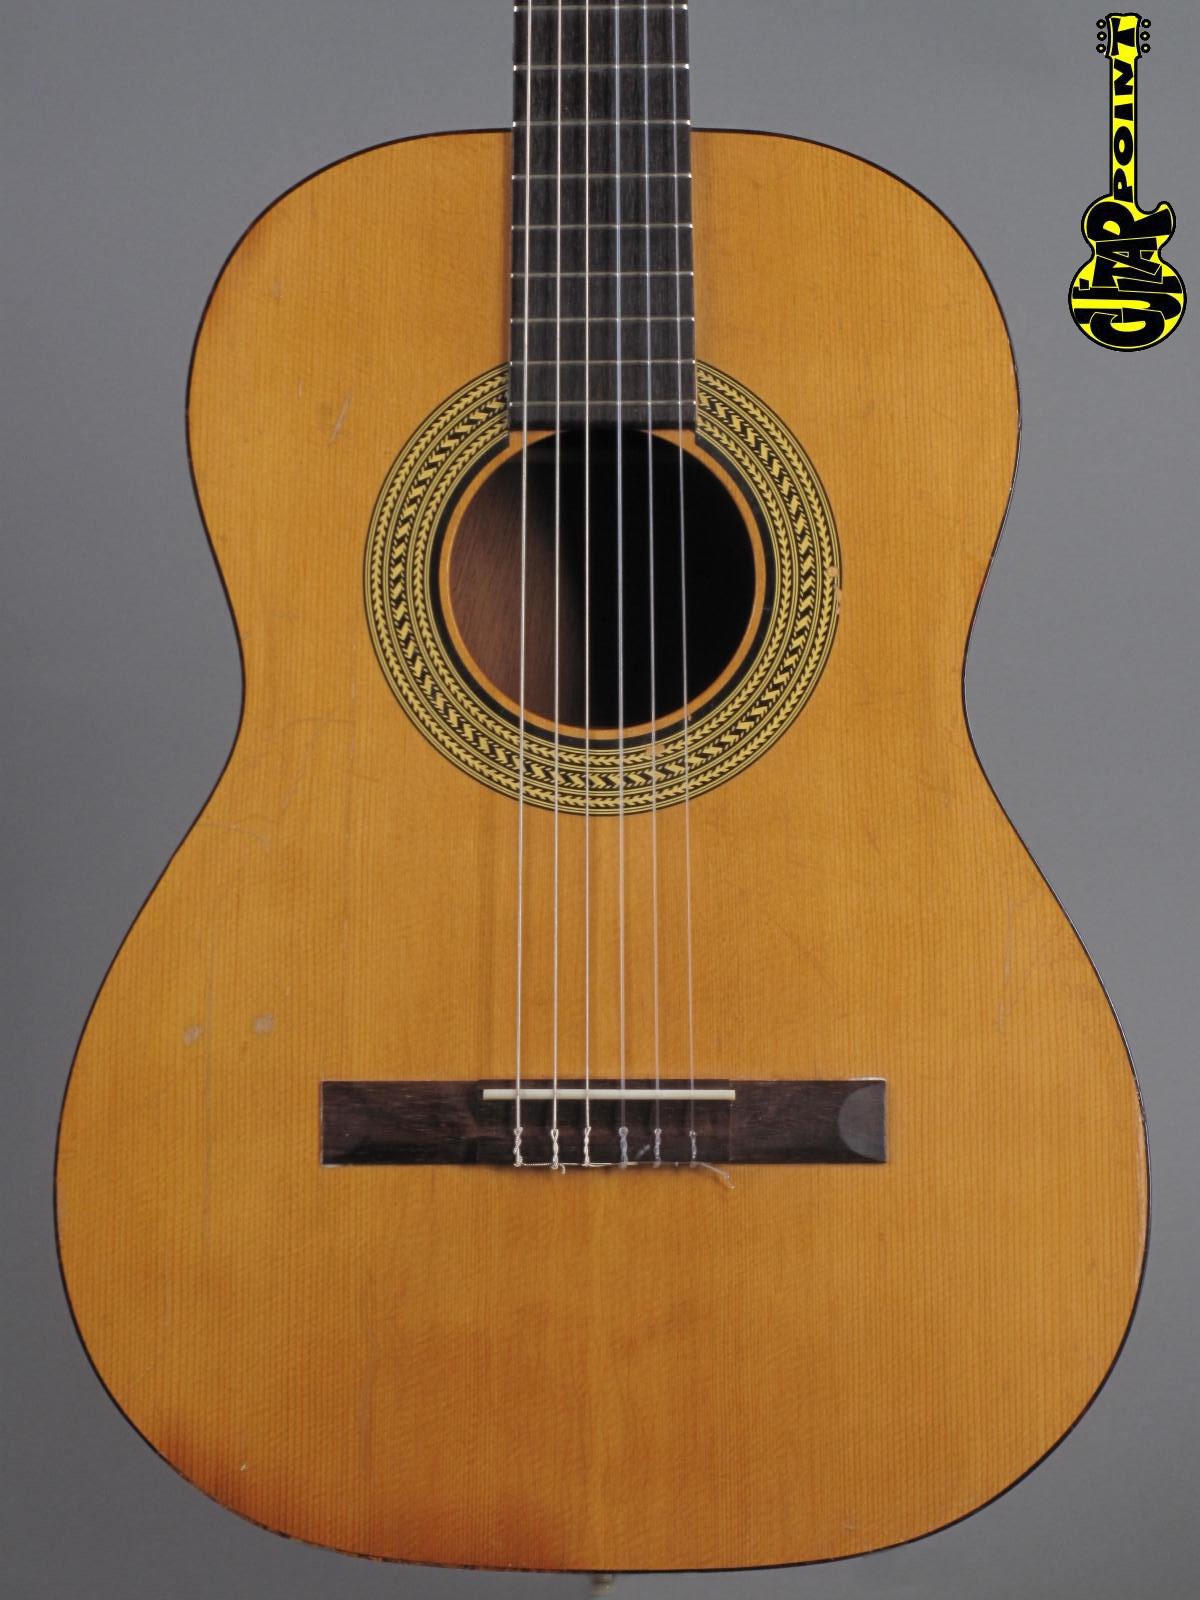 1969 Gibson C1 Classical Nylon-String